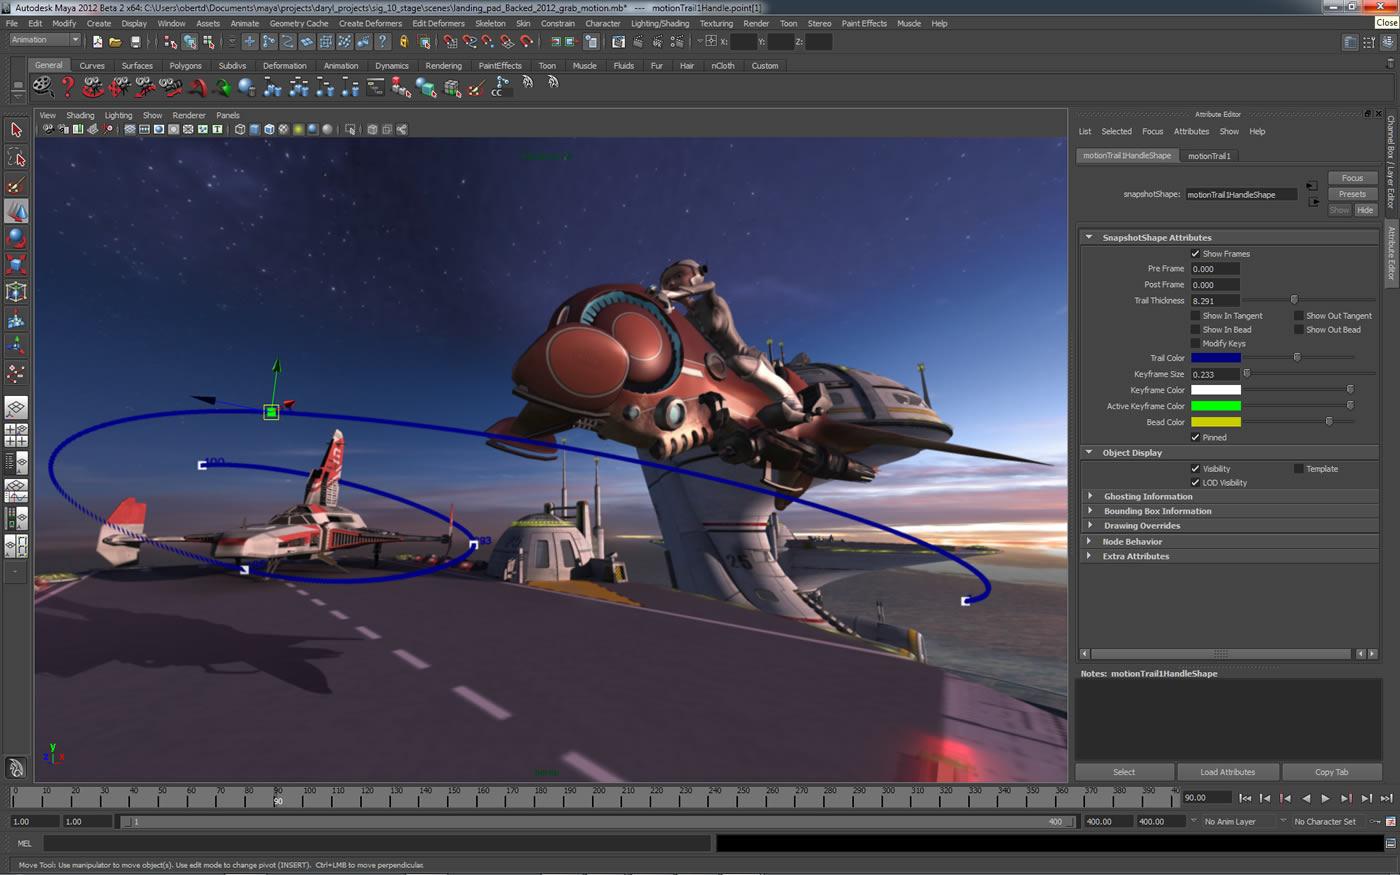 Autodesk Maya 2012 full screenshot